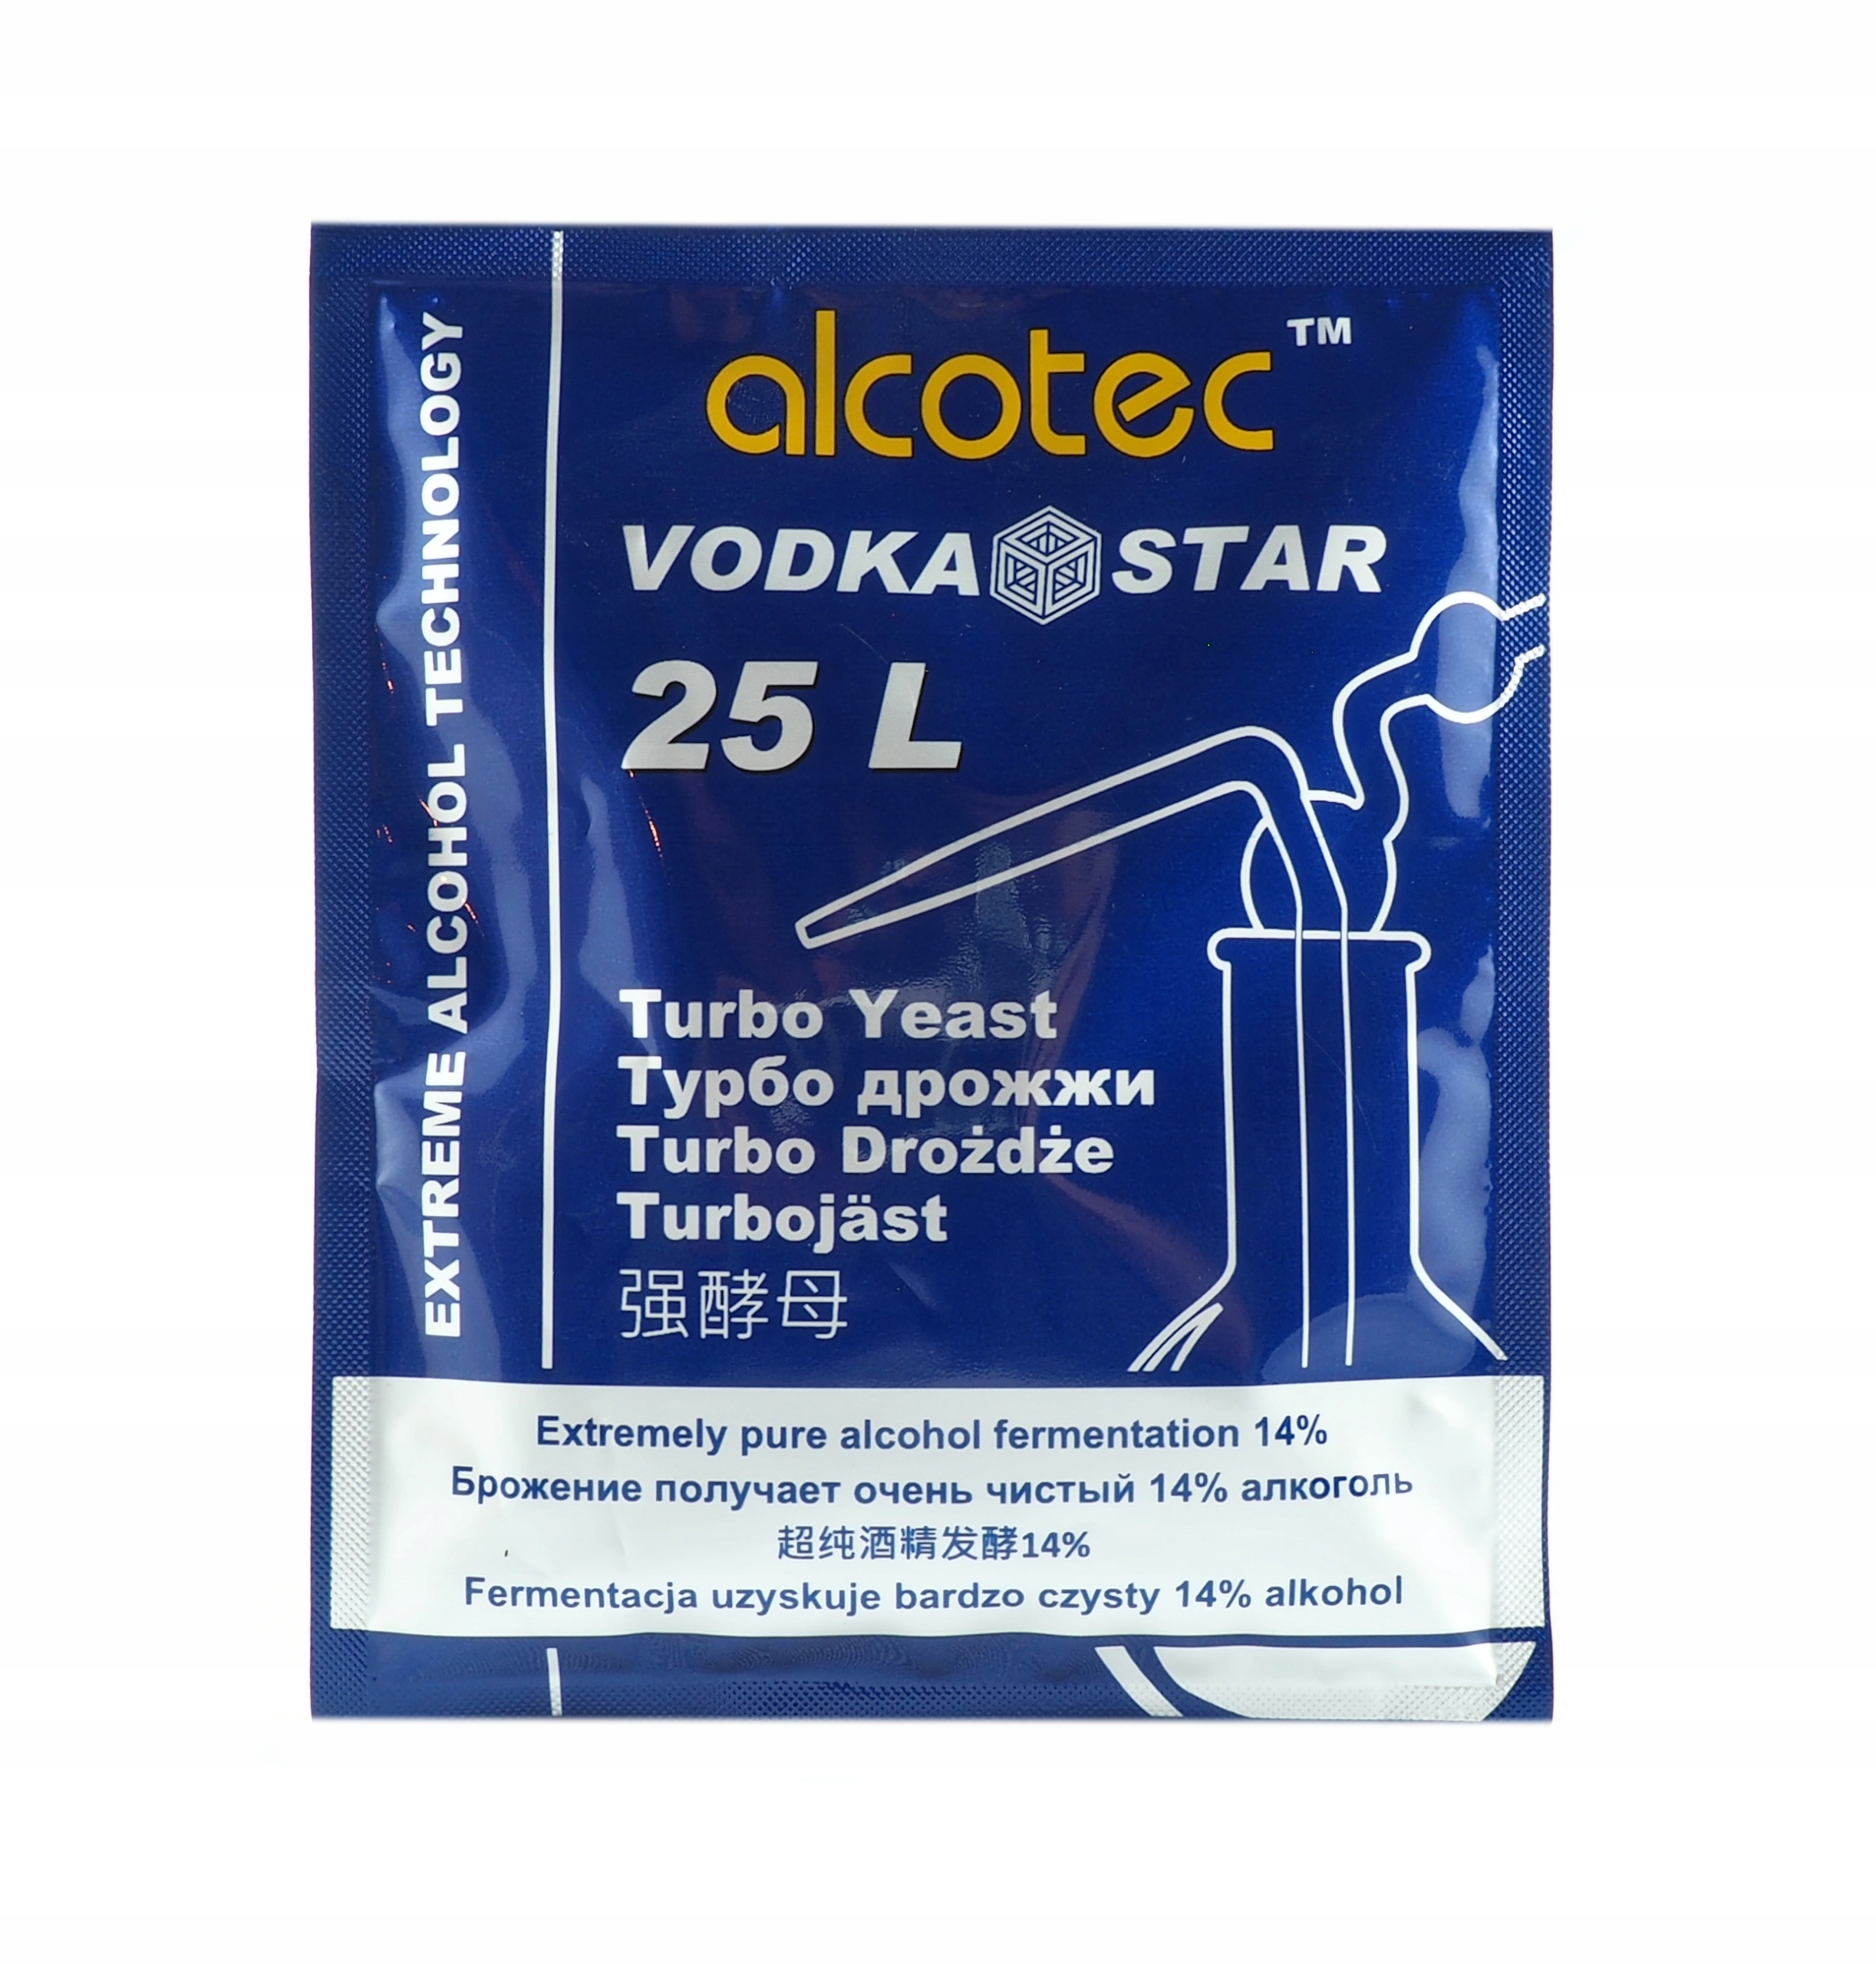 дрожжи для дистилляции Alcotec Vodka Star Турбо pure